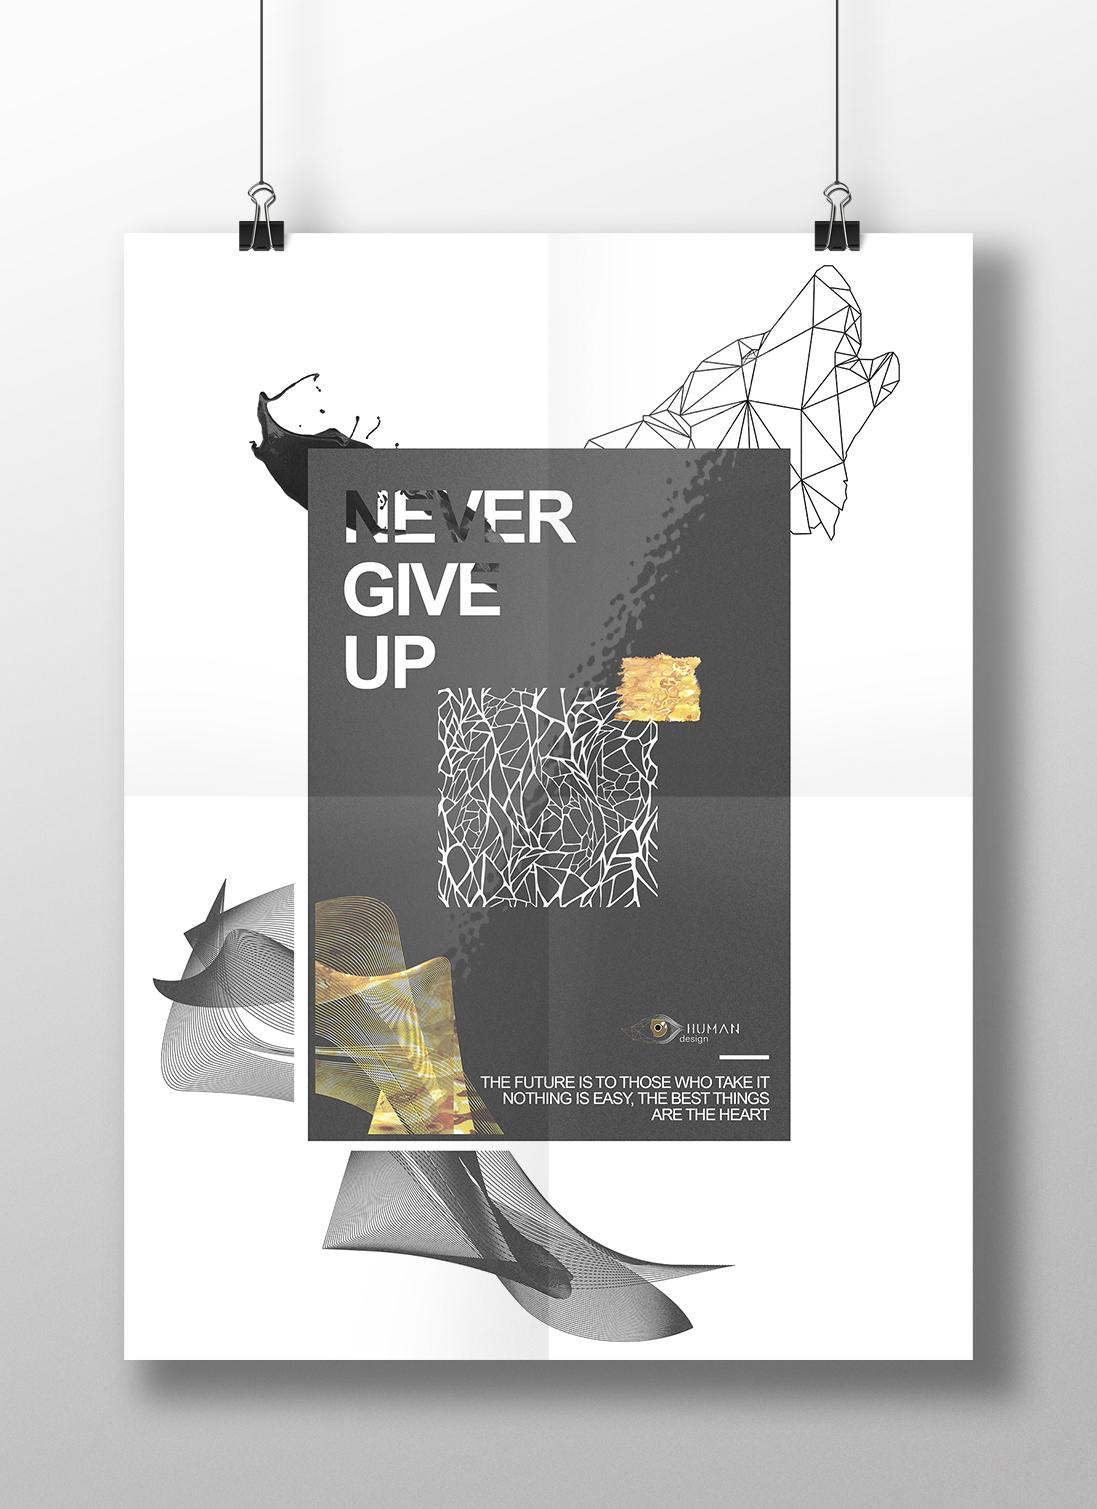 Mockup vsco wacom ILLUSTRATION  graphicdesign free adobelive download poster branding  2017freemockup summer2017